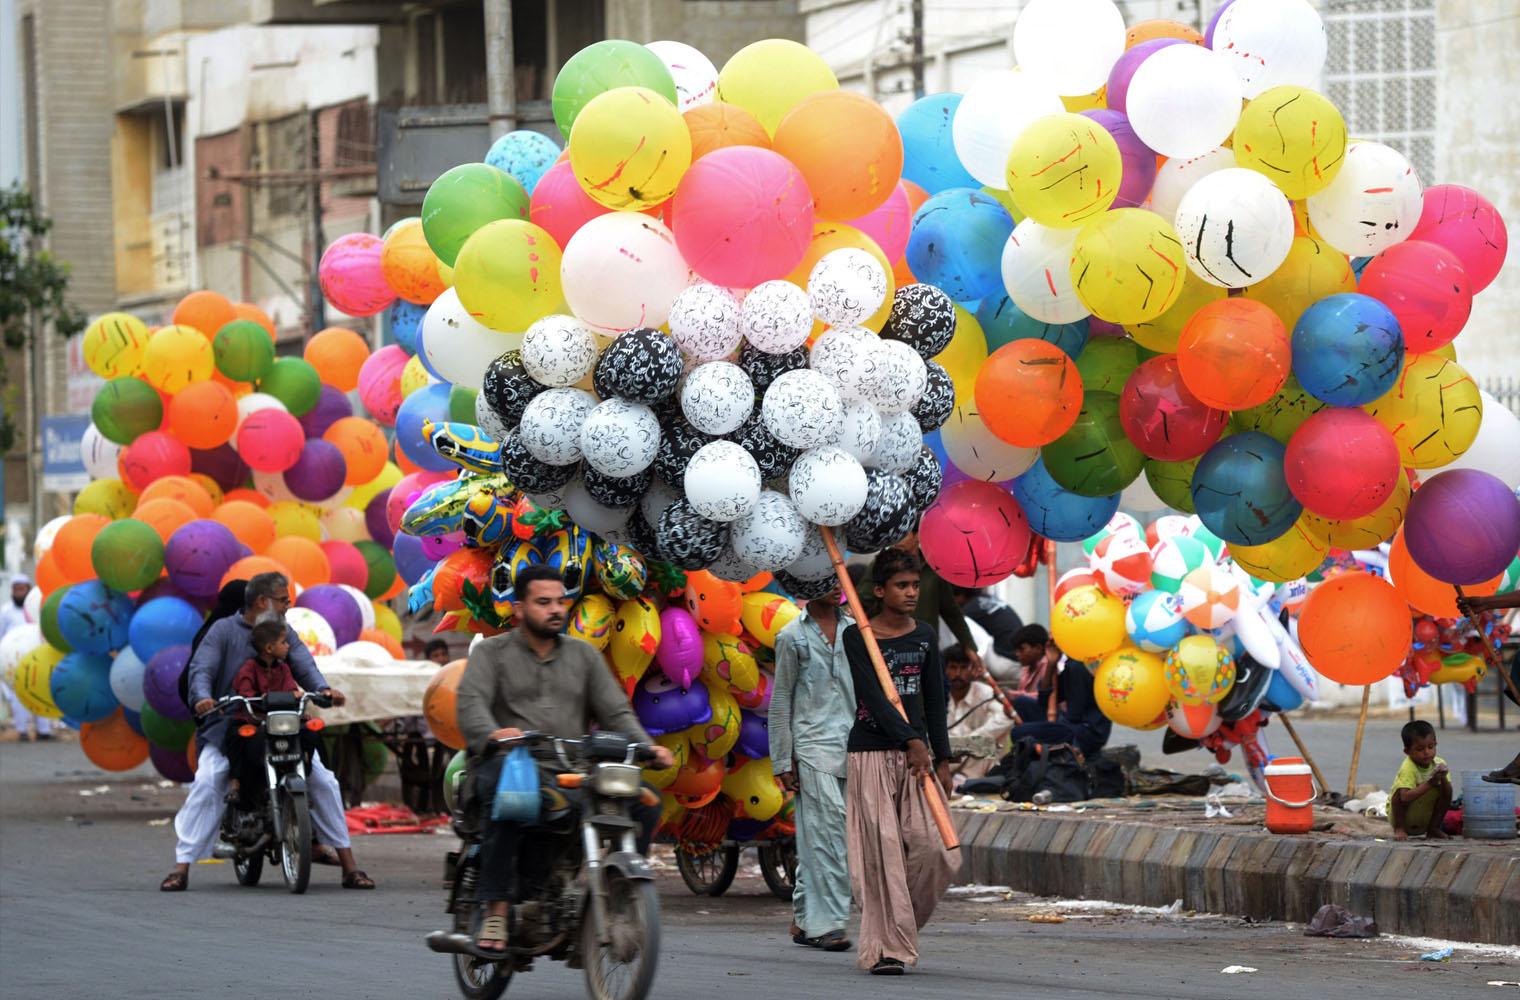 Eid Ul Fitr Celebration picture Karachi Pakistan